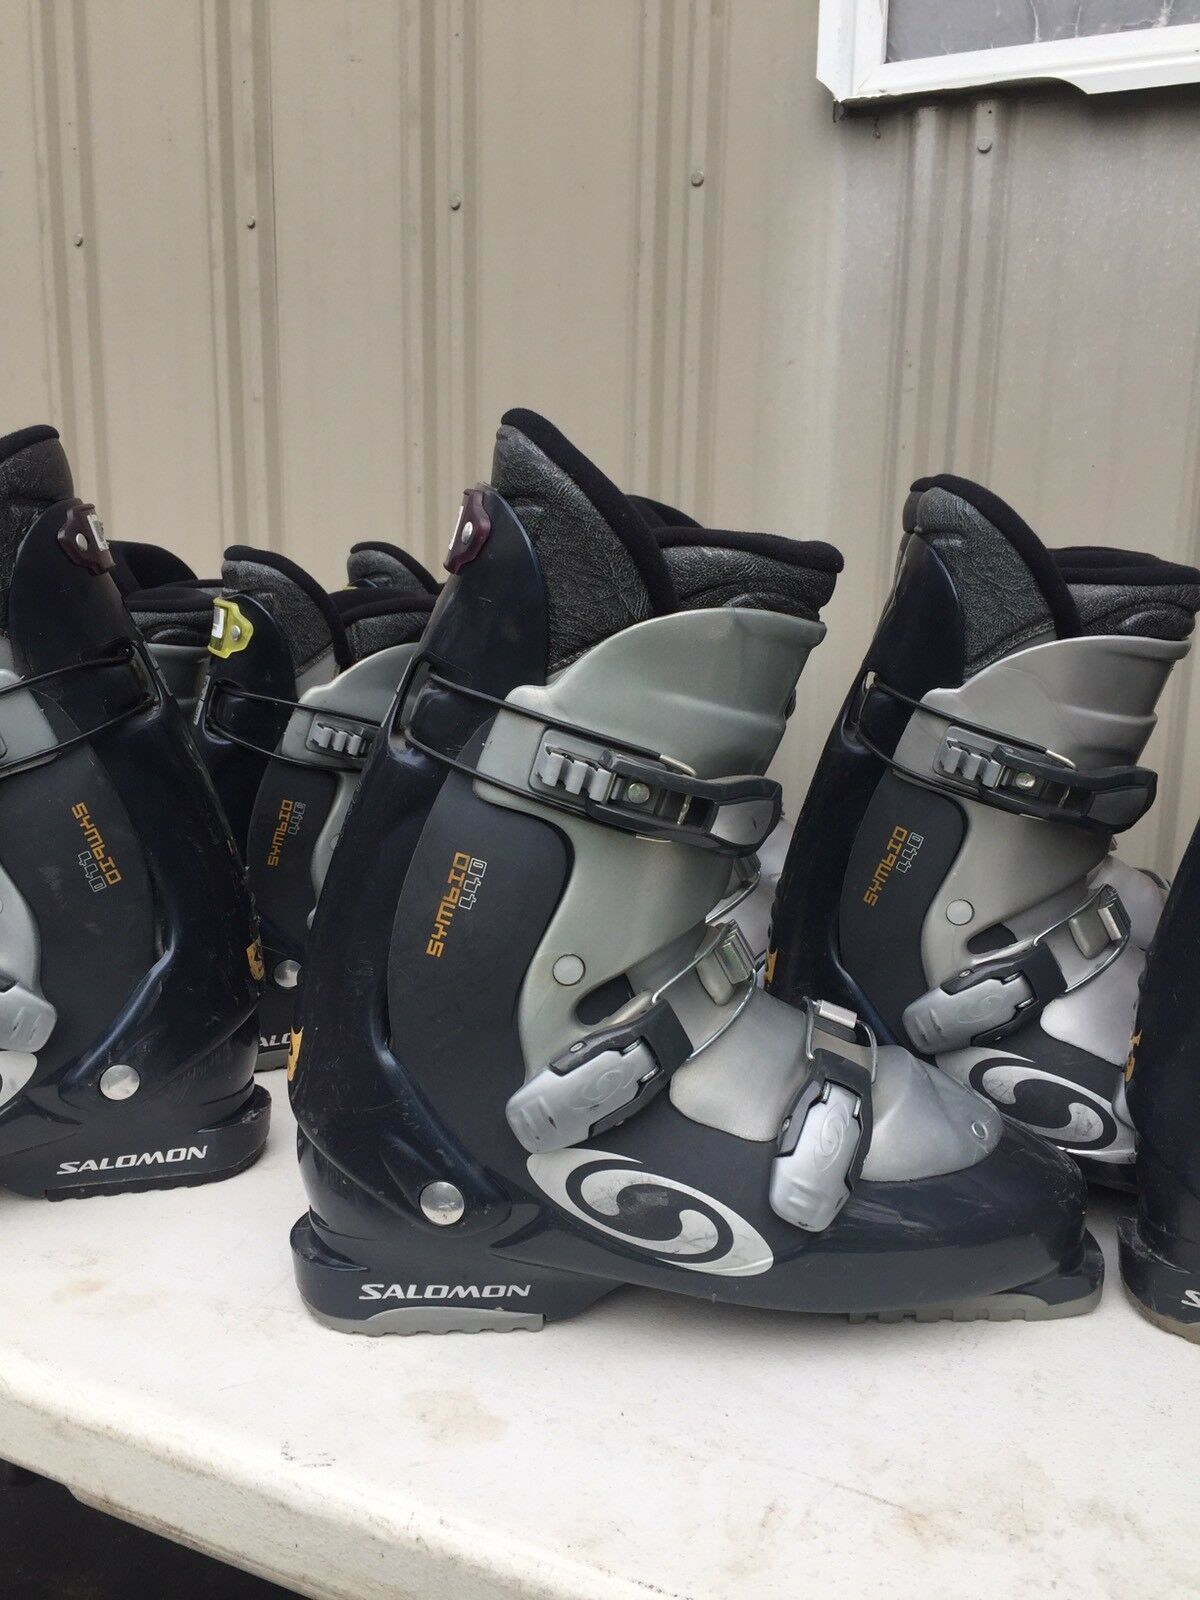 Salomon Symbio 440 Ski Boots  Geat Deal   GREAT CONDITION